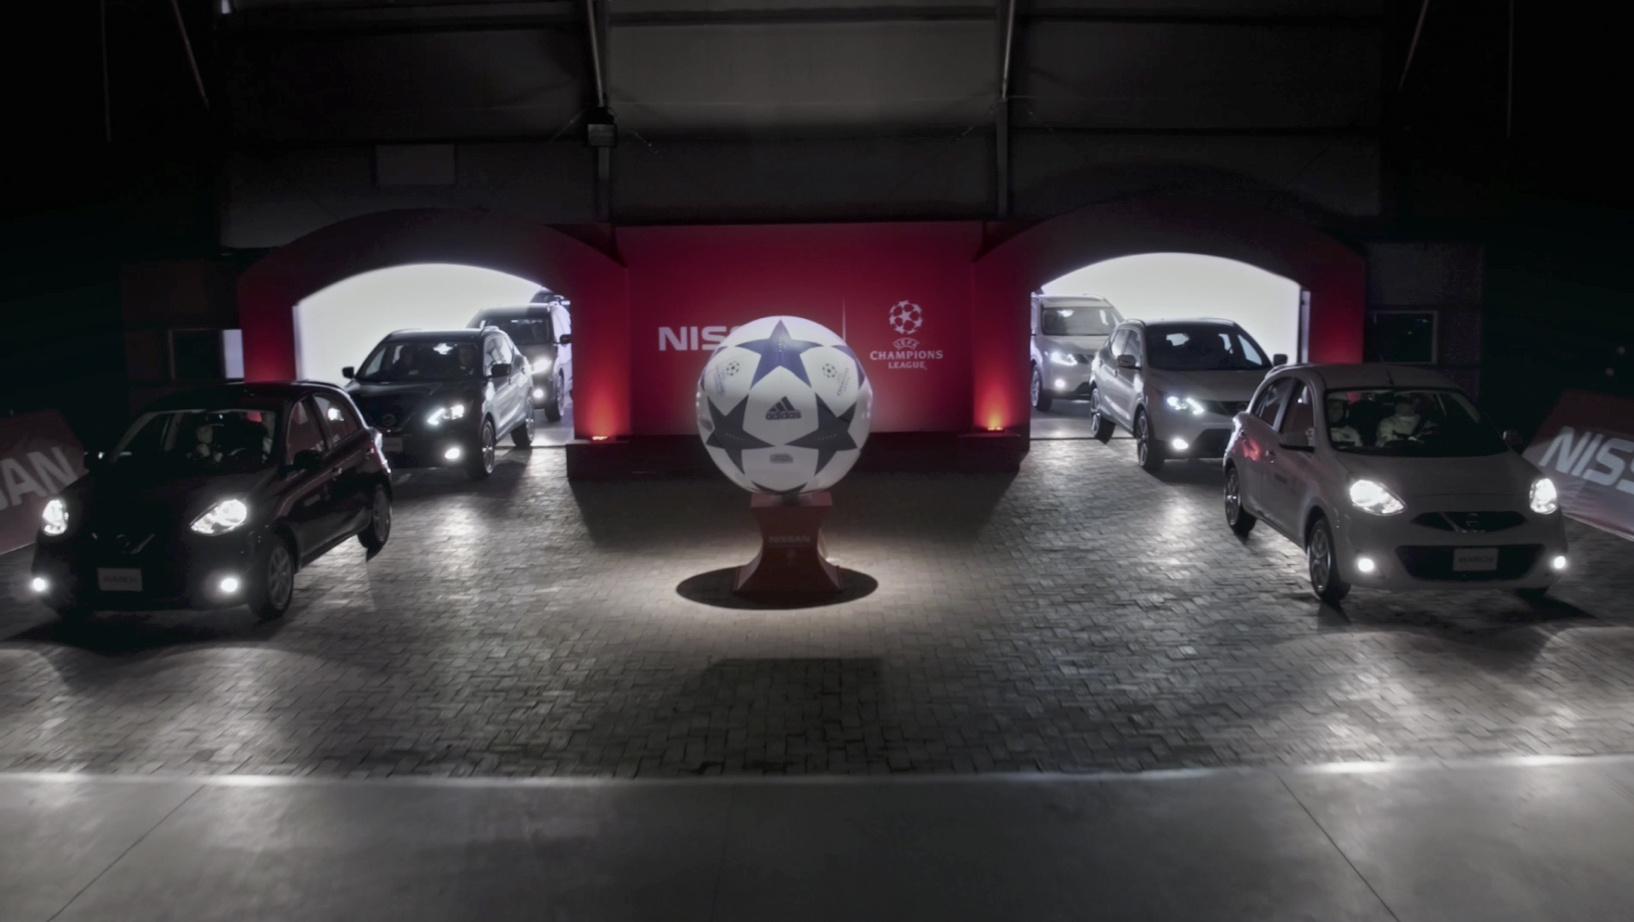 Auto-fútbol pone a Nissan como protagonista